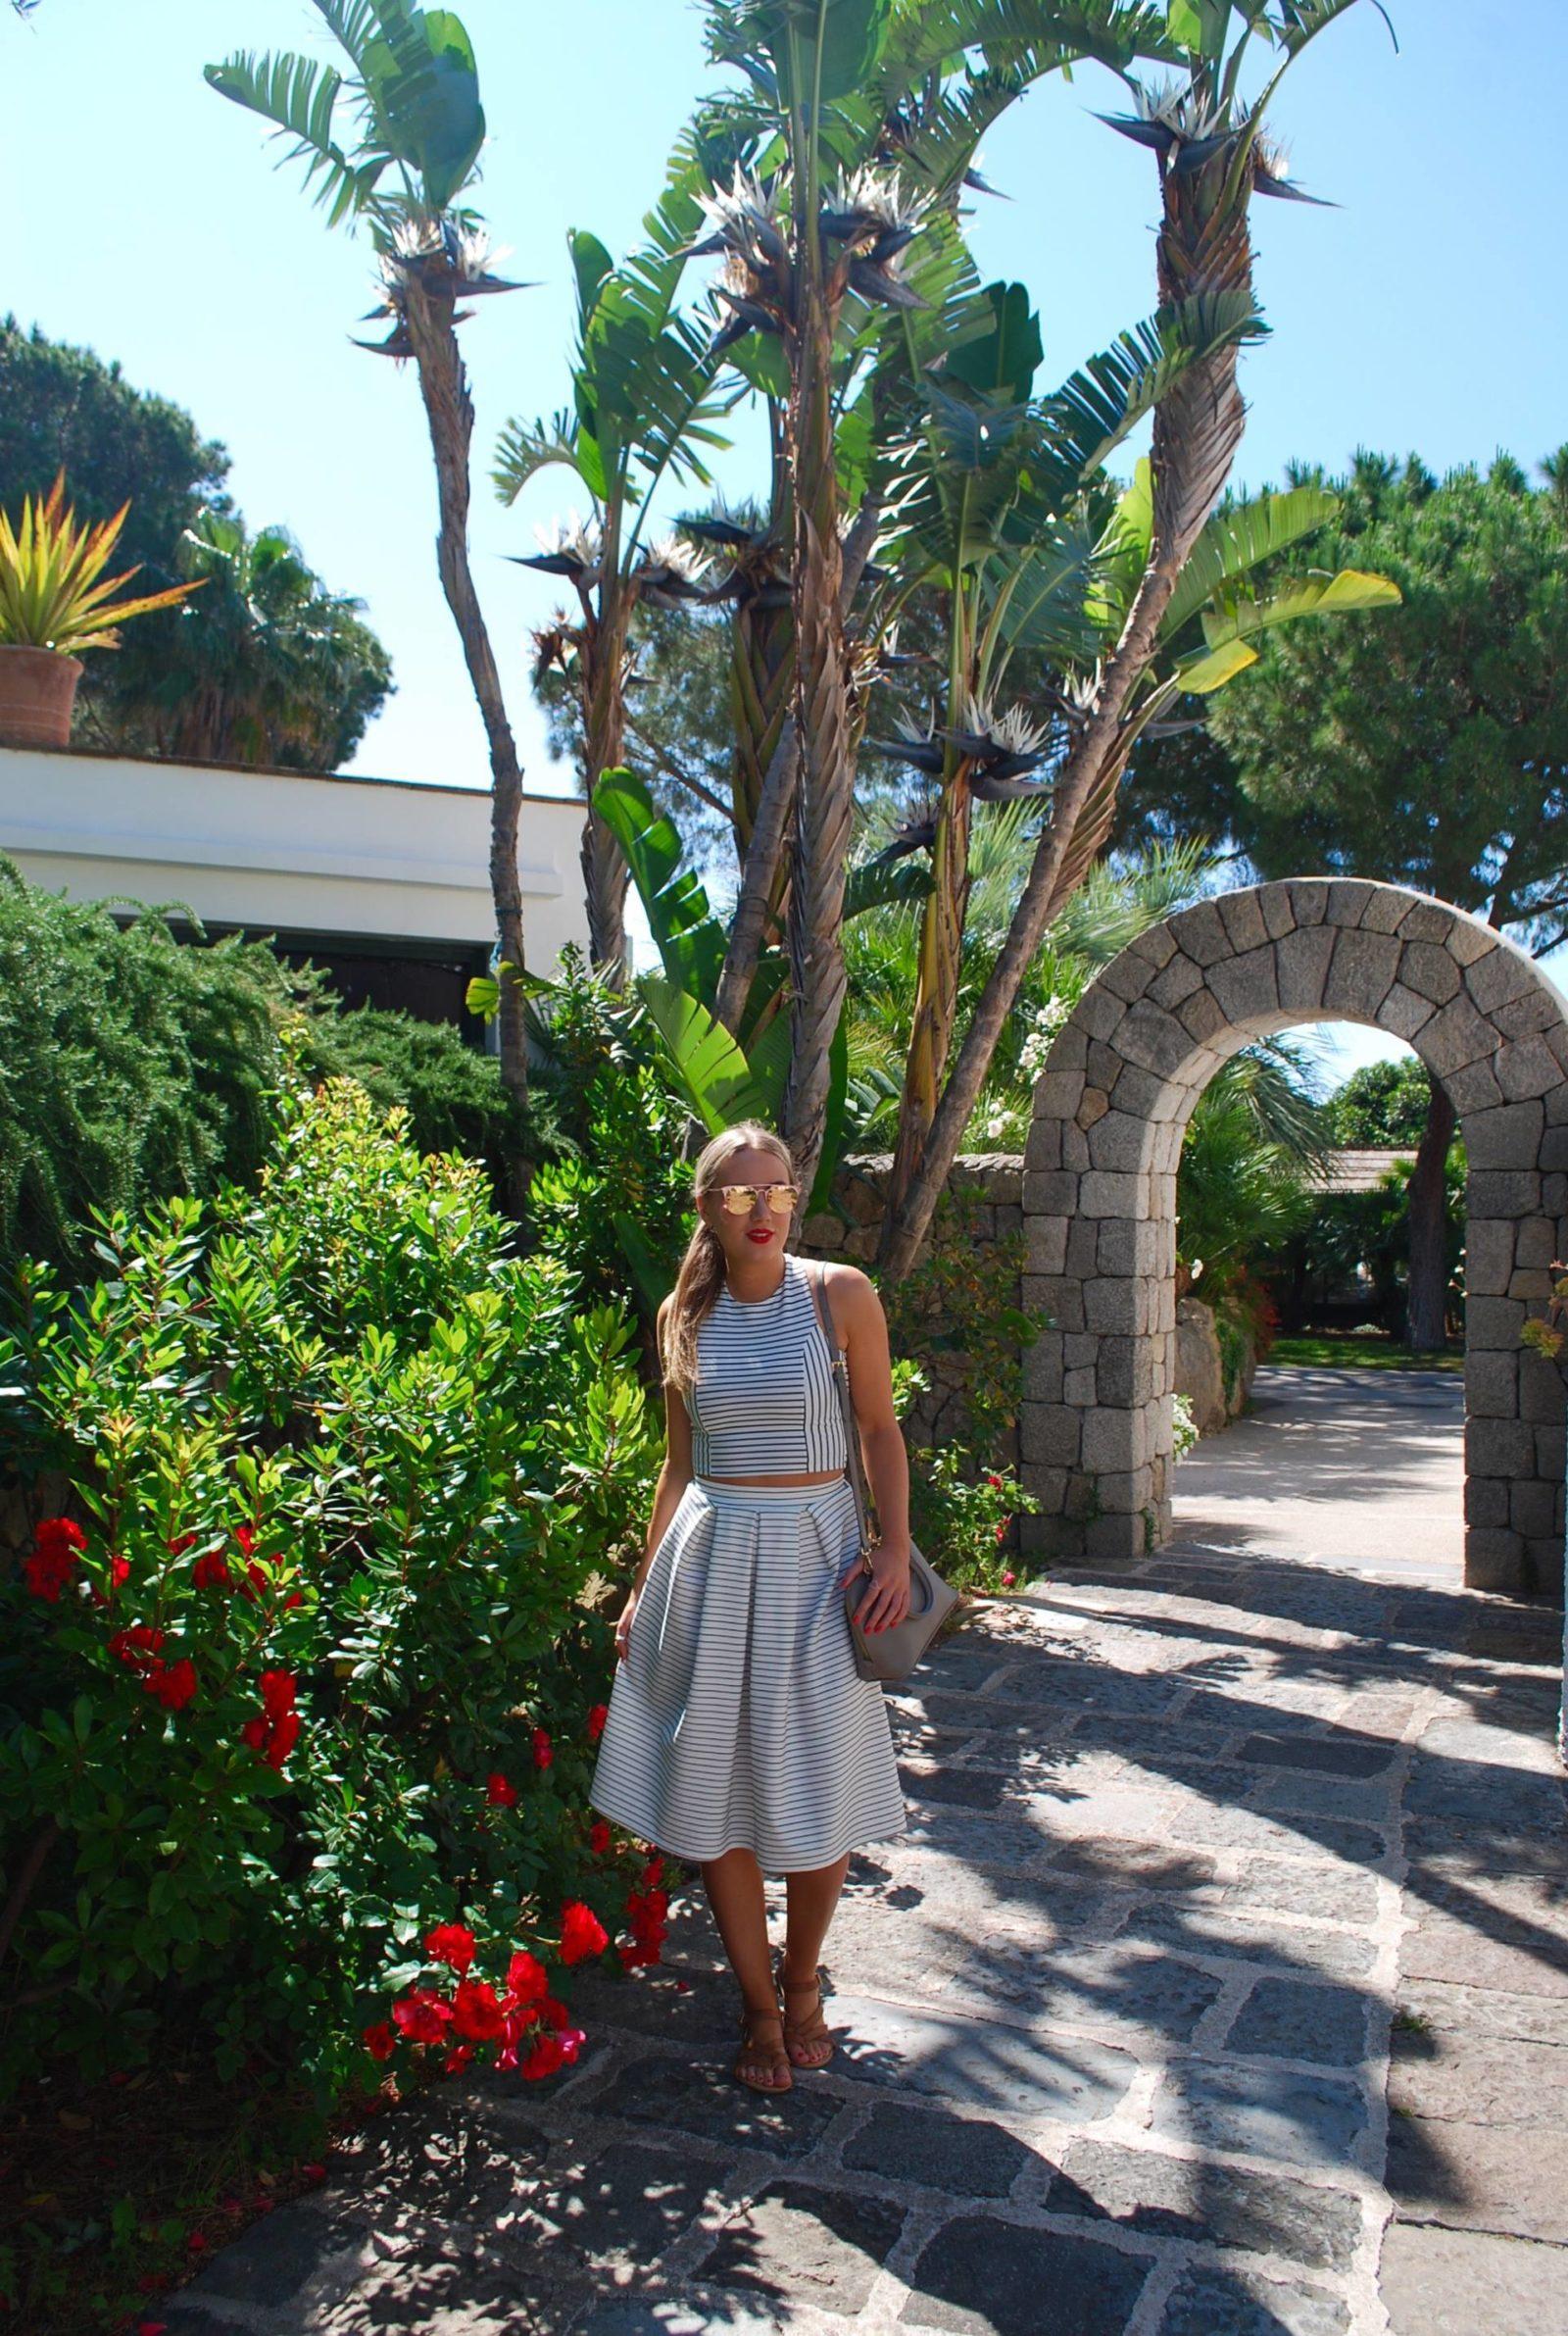 garden-villas-resport-ischia-the-travelista-2